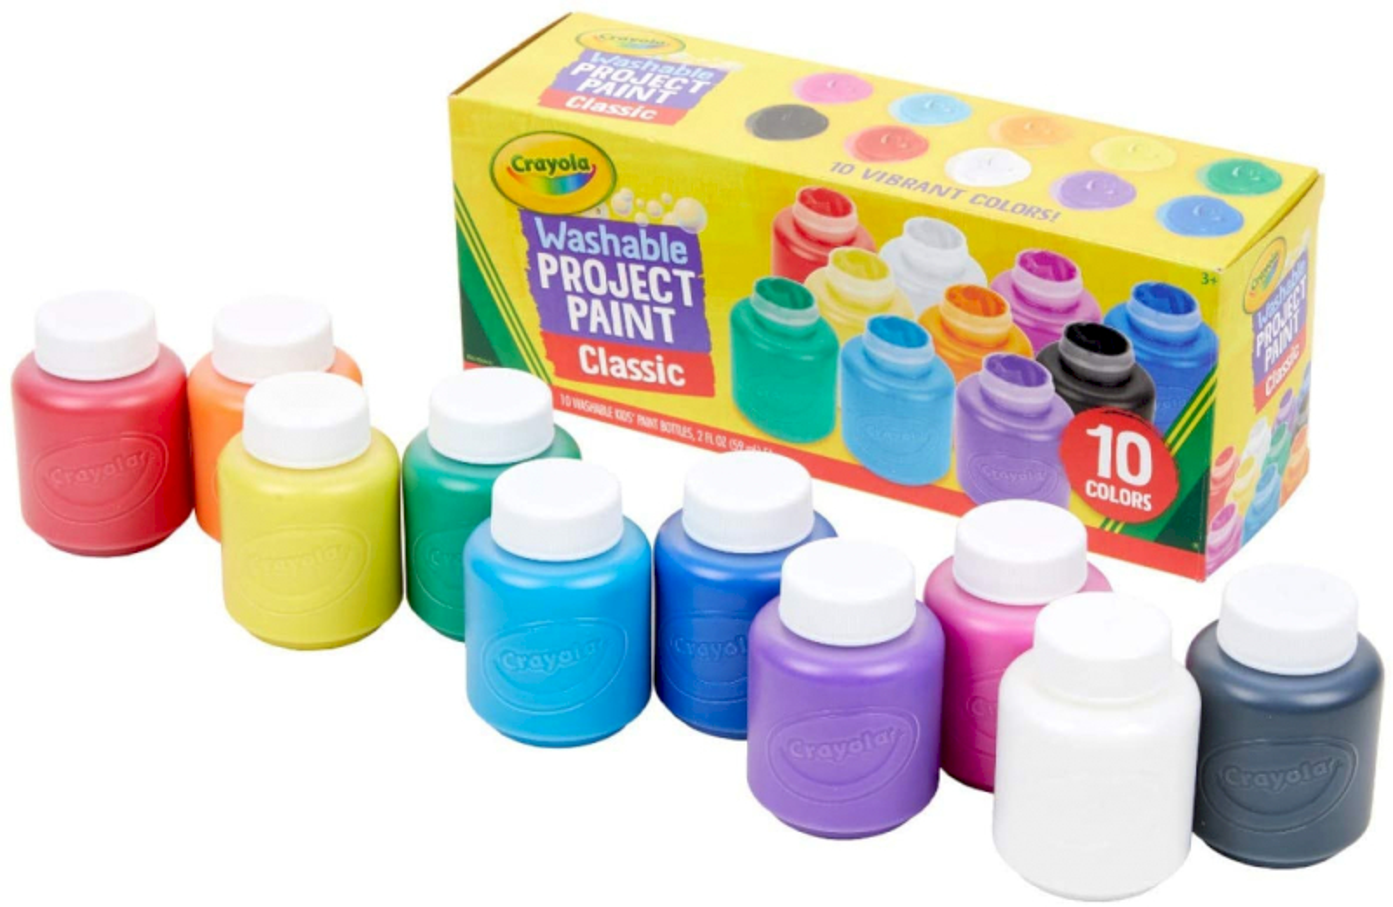 10 Tempere Lavabilissimi Crayola